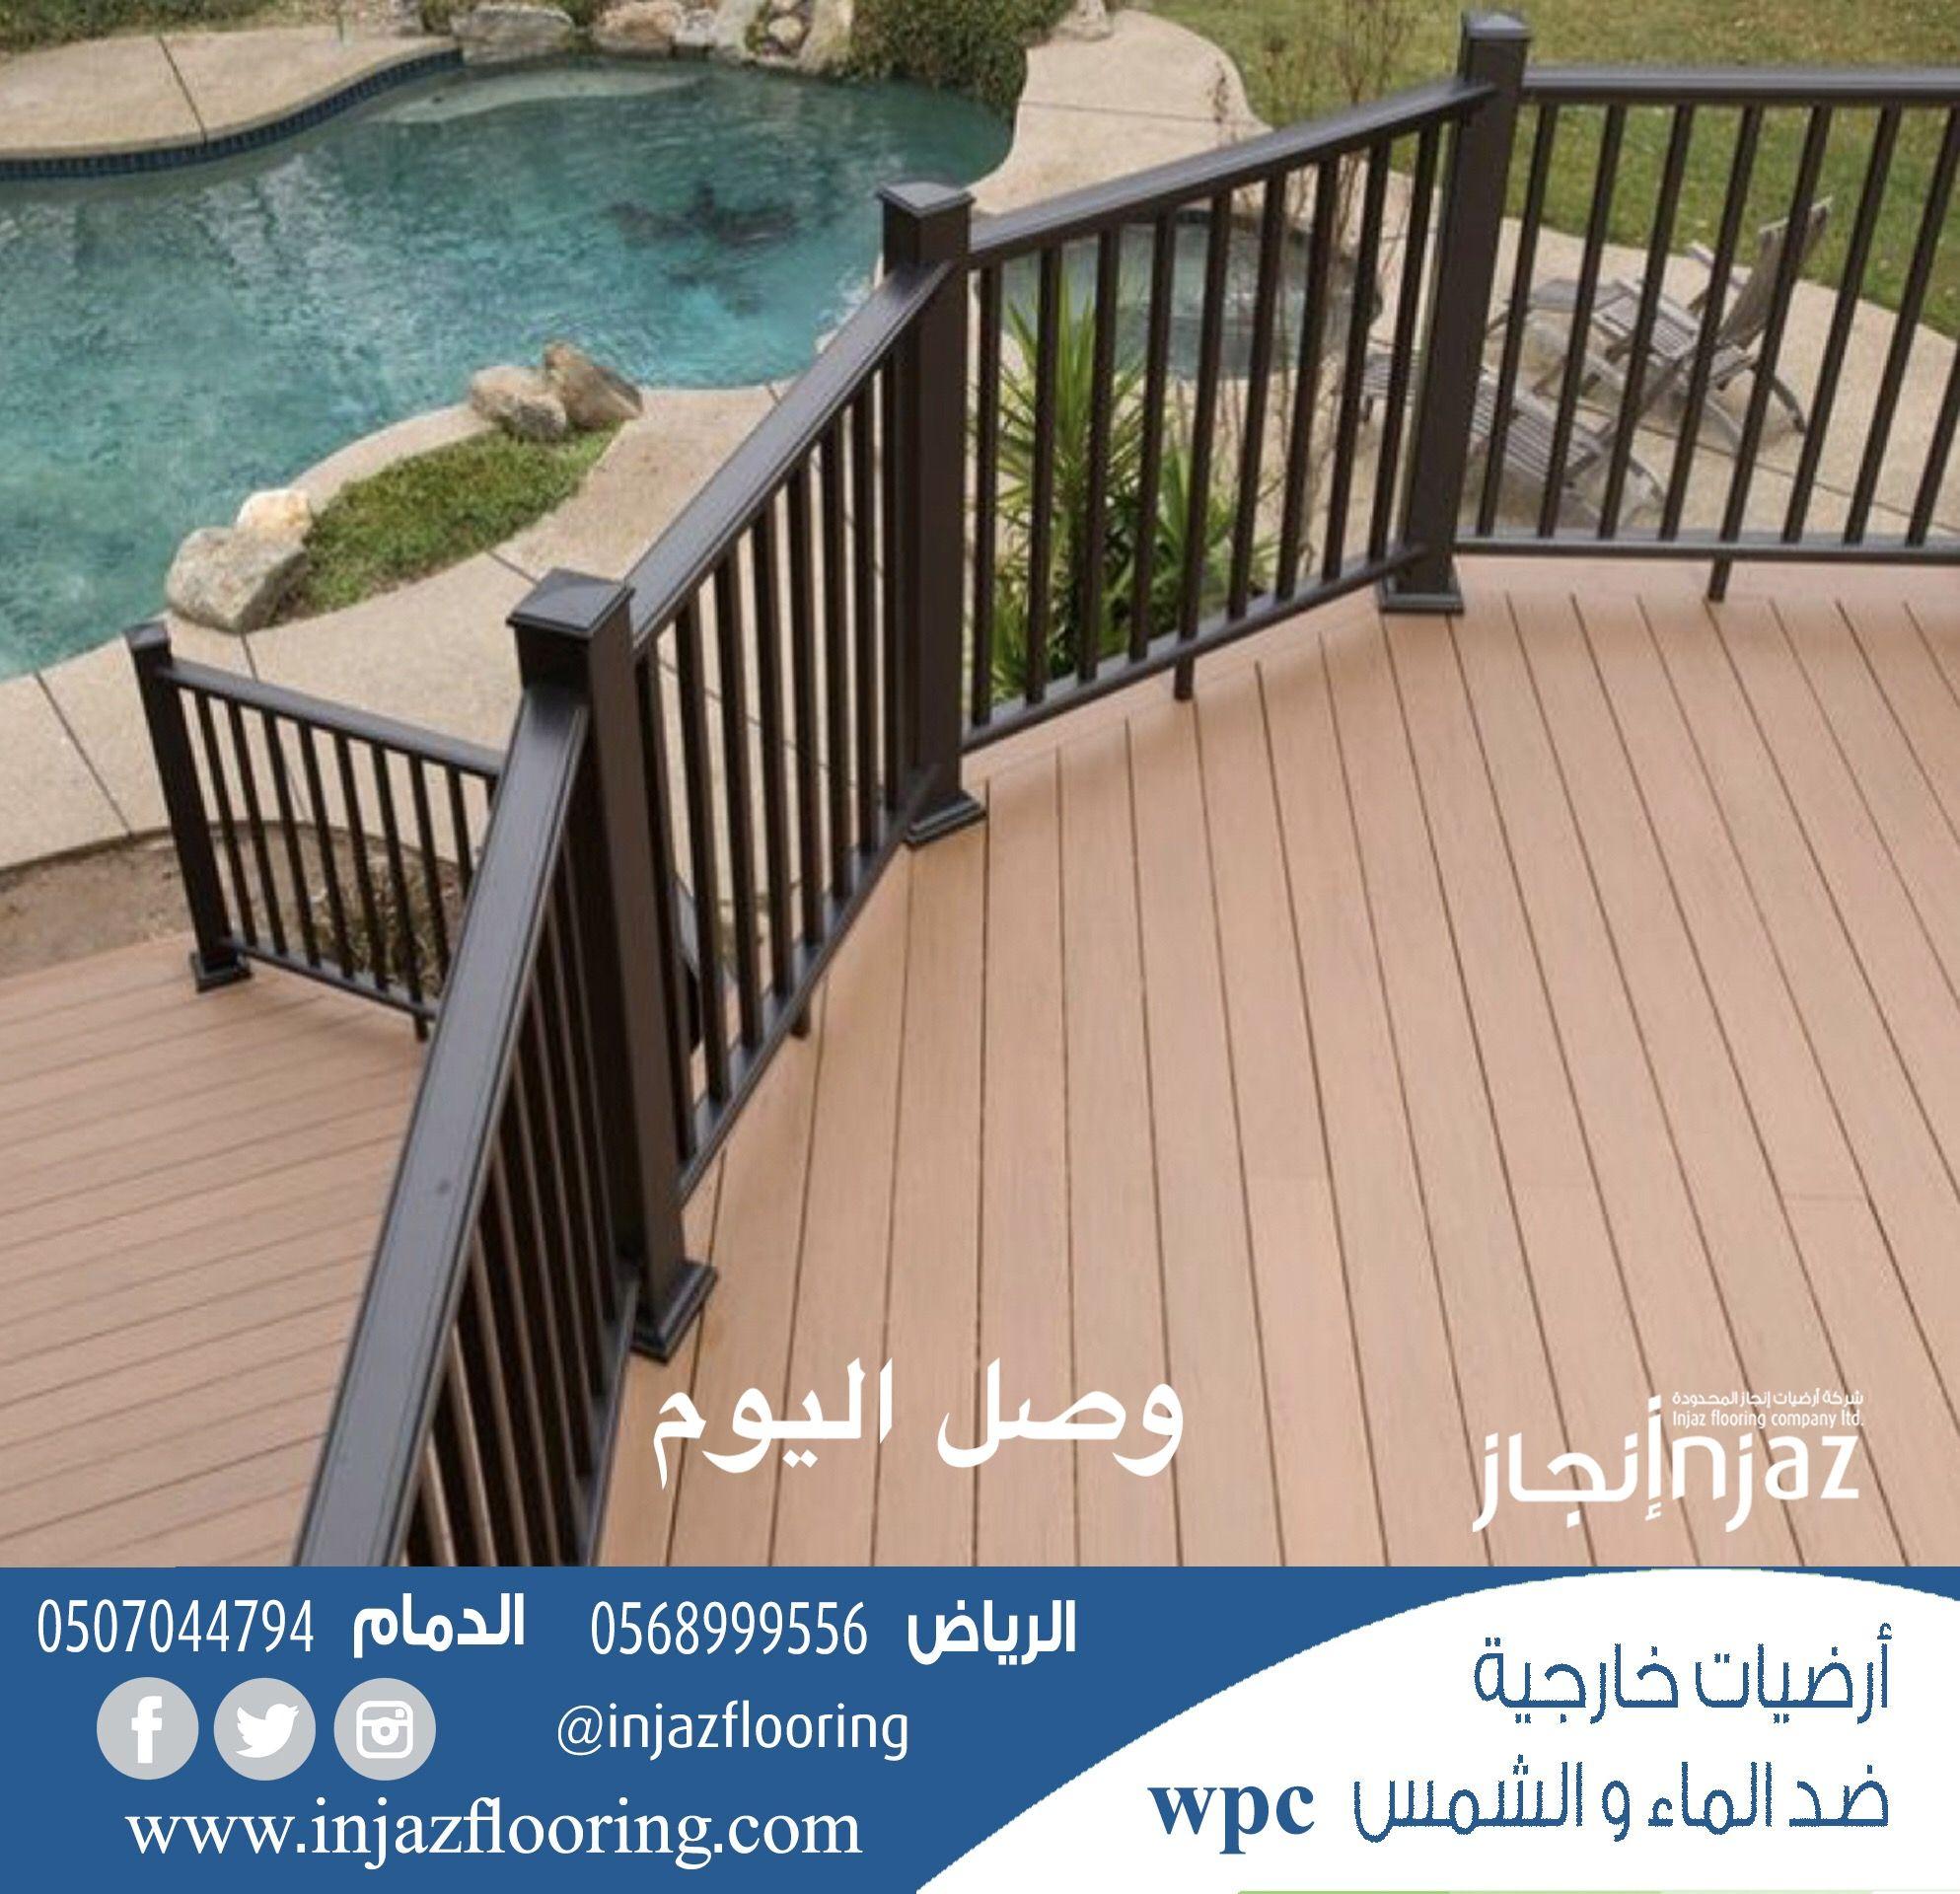 ارضيات خارجية Wpc Outdoor Home Decor Outdoor Decor